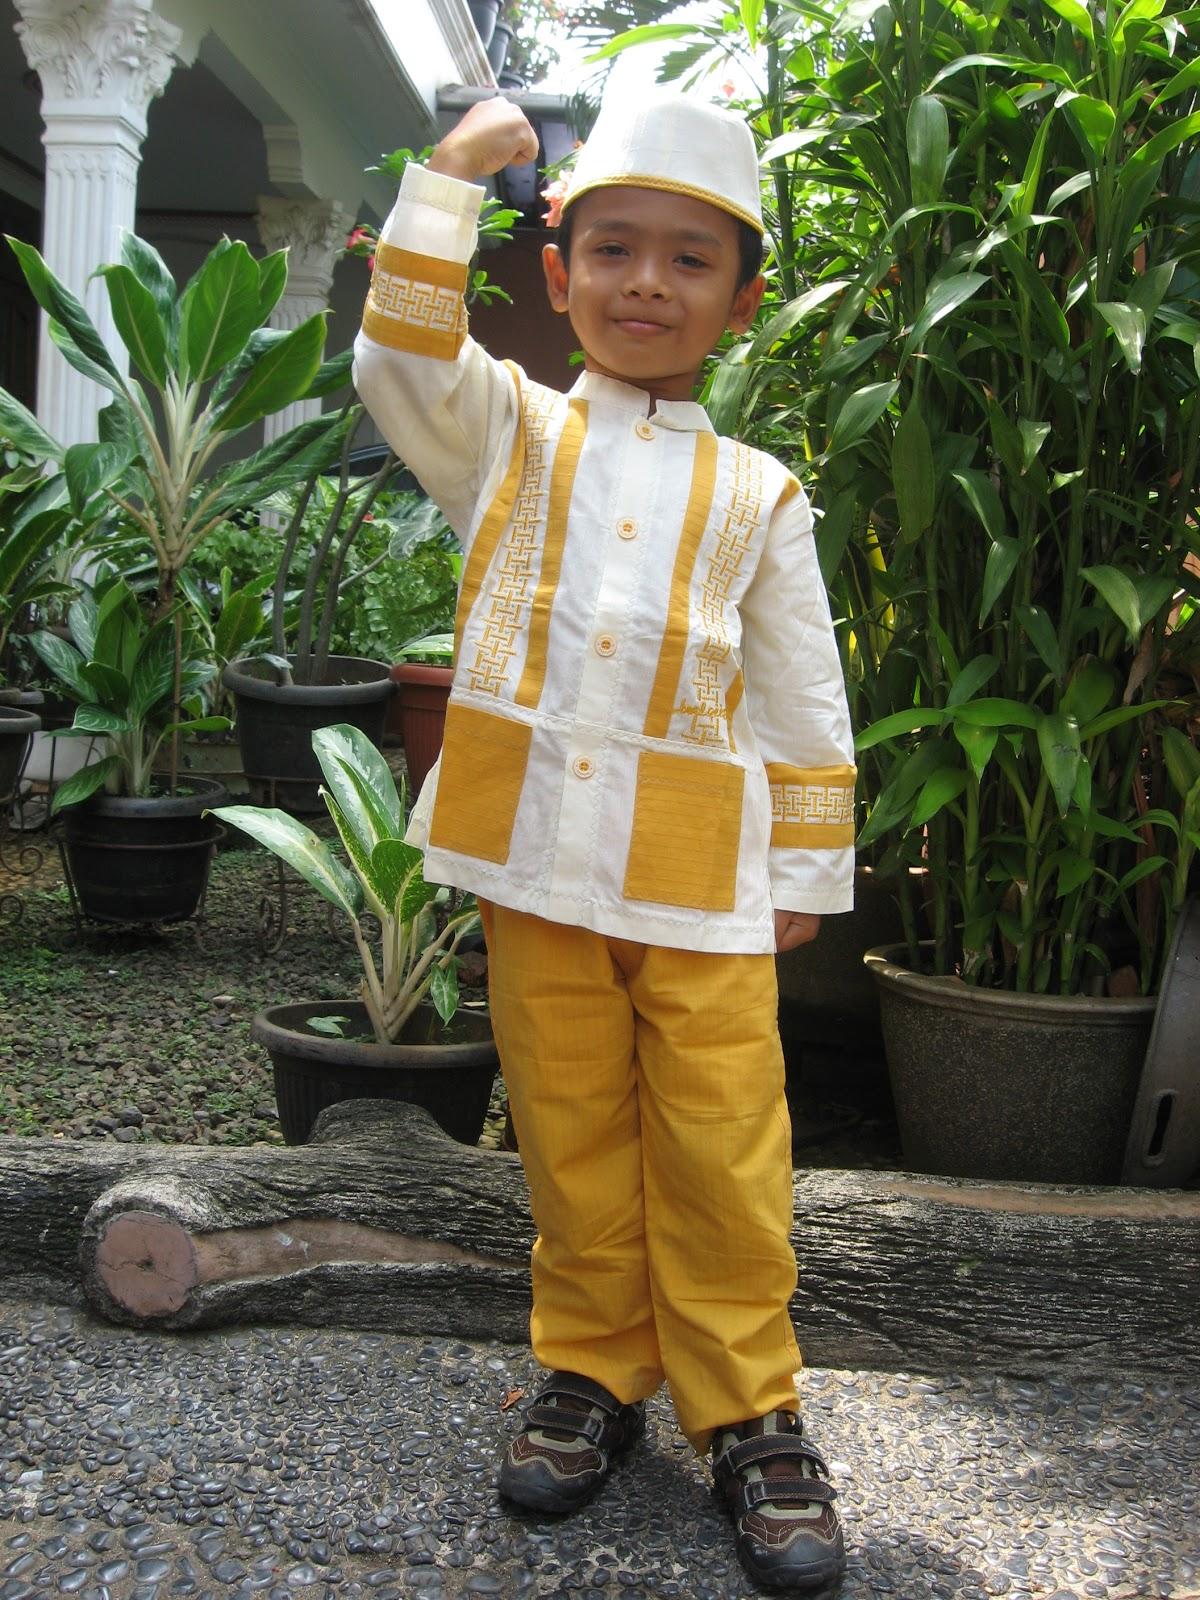 Baju Gamis Anak Pria Bayi Berompi Motif Flower Hello Kity 6 12 Bln Available 4 Color Modelbaju24 Model Koko Laki Terbaru